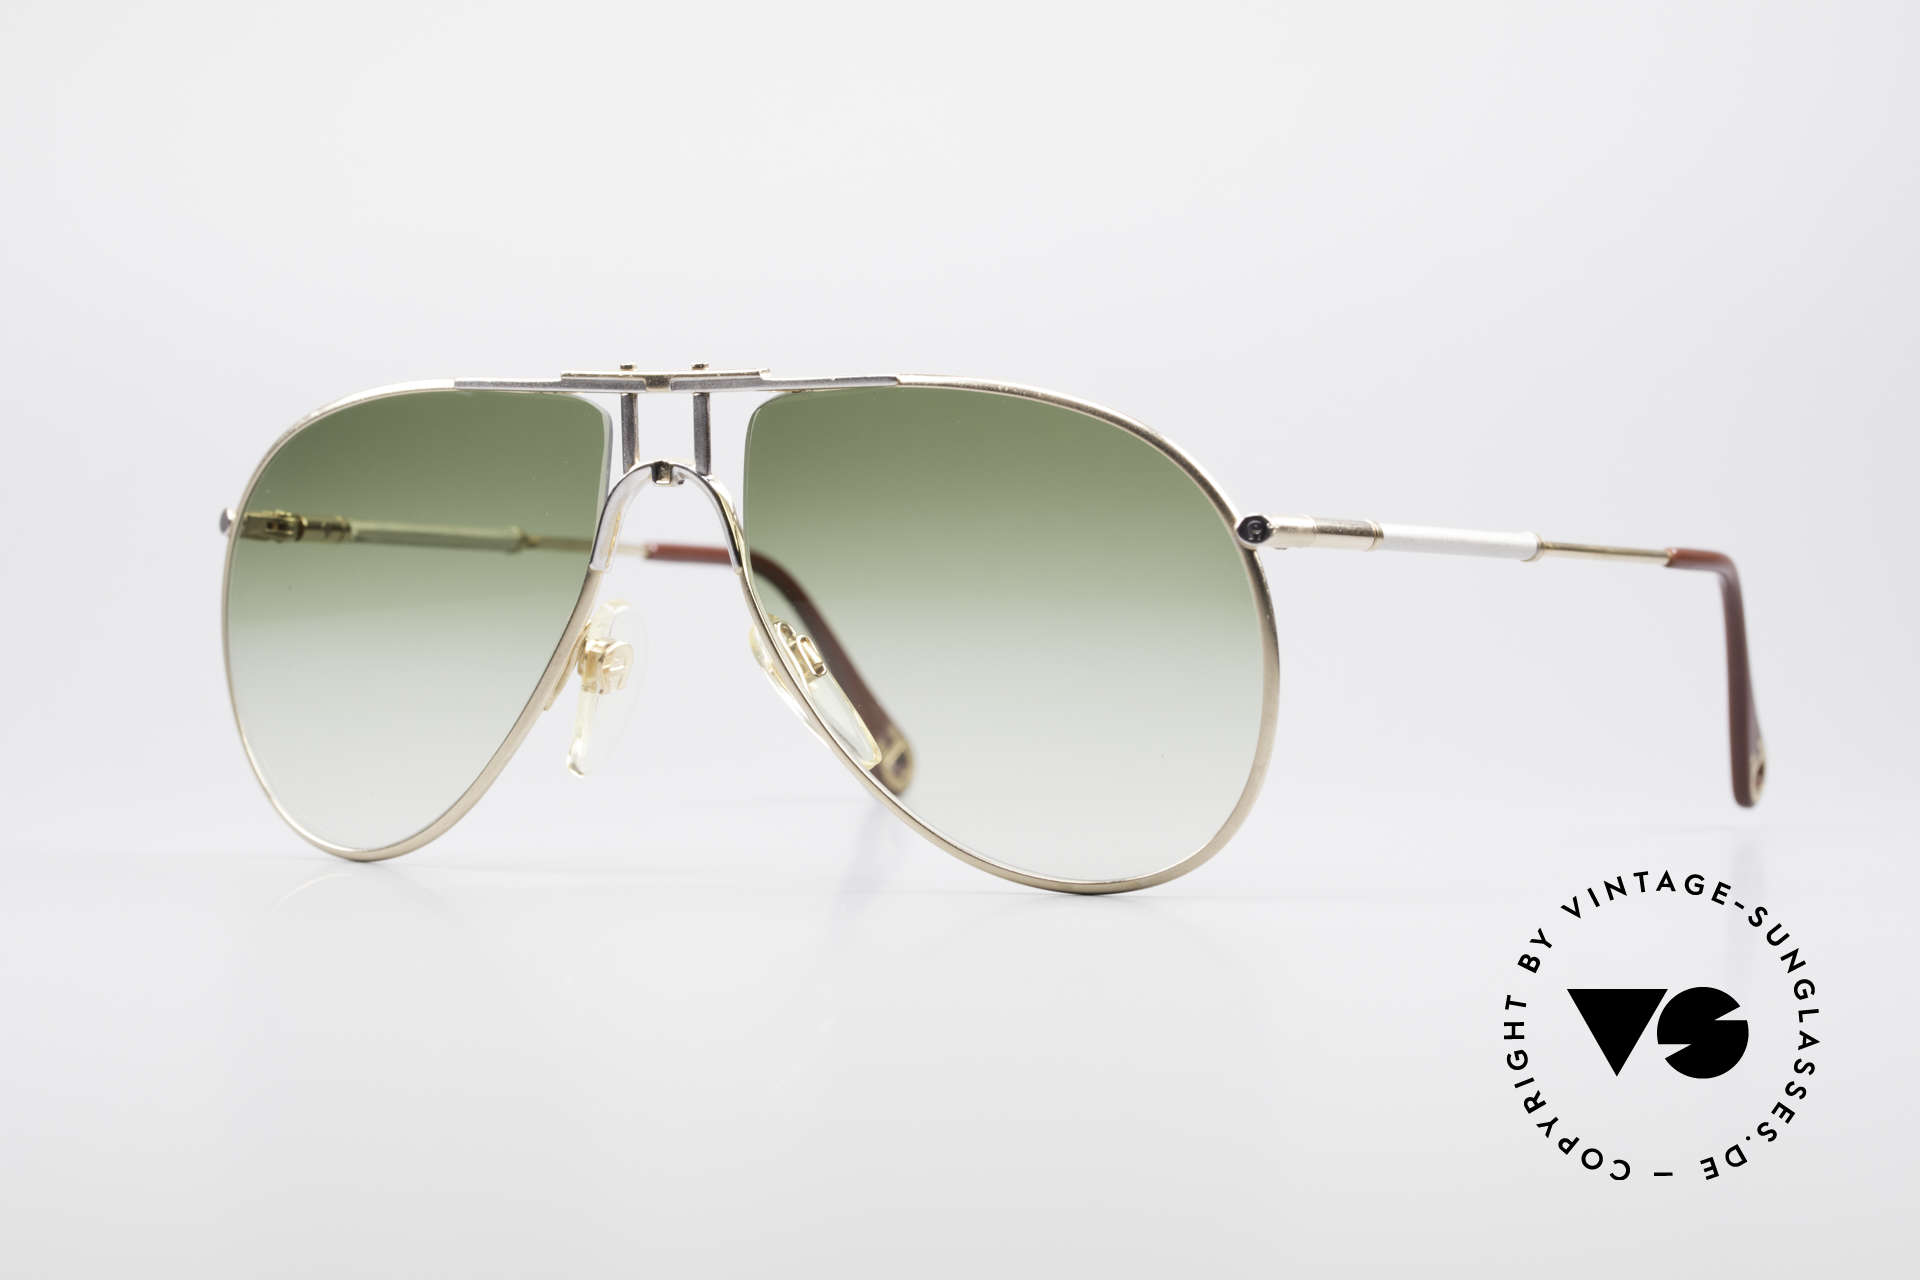 Aigner EA4 80's Luxury Sunglasses Men, Etienne Aigner VINTAGE designer sunglasses of the 80's, Made for Men